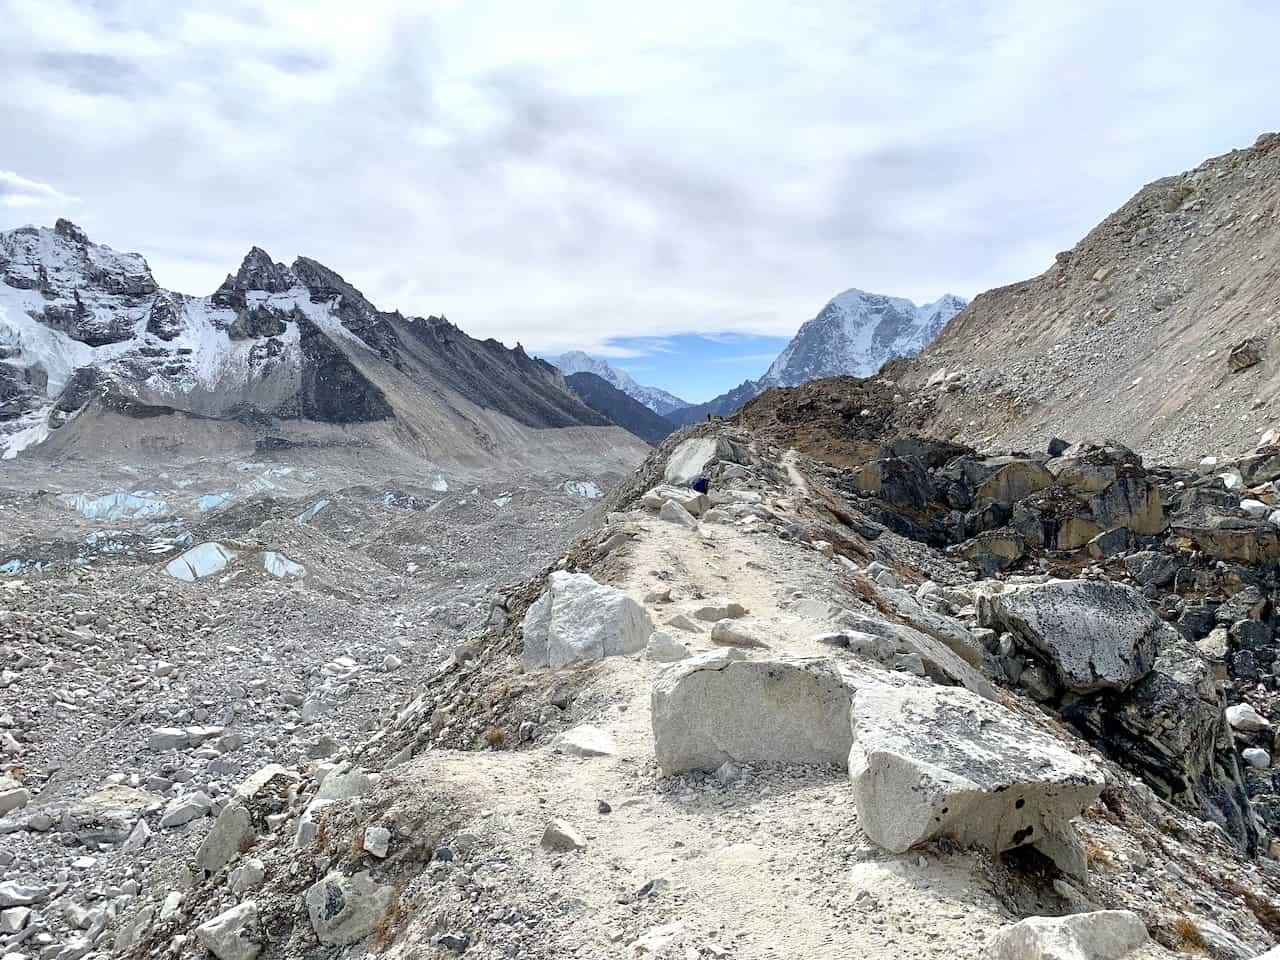 Everest Base Camp to Gorak Shep